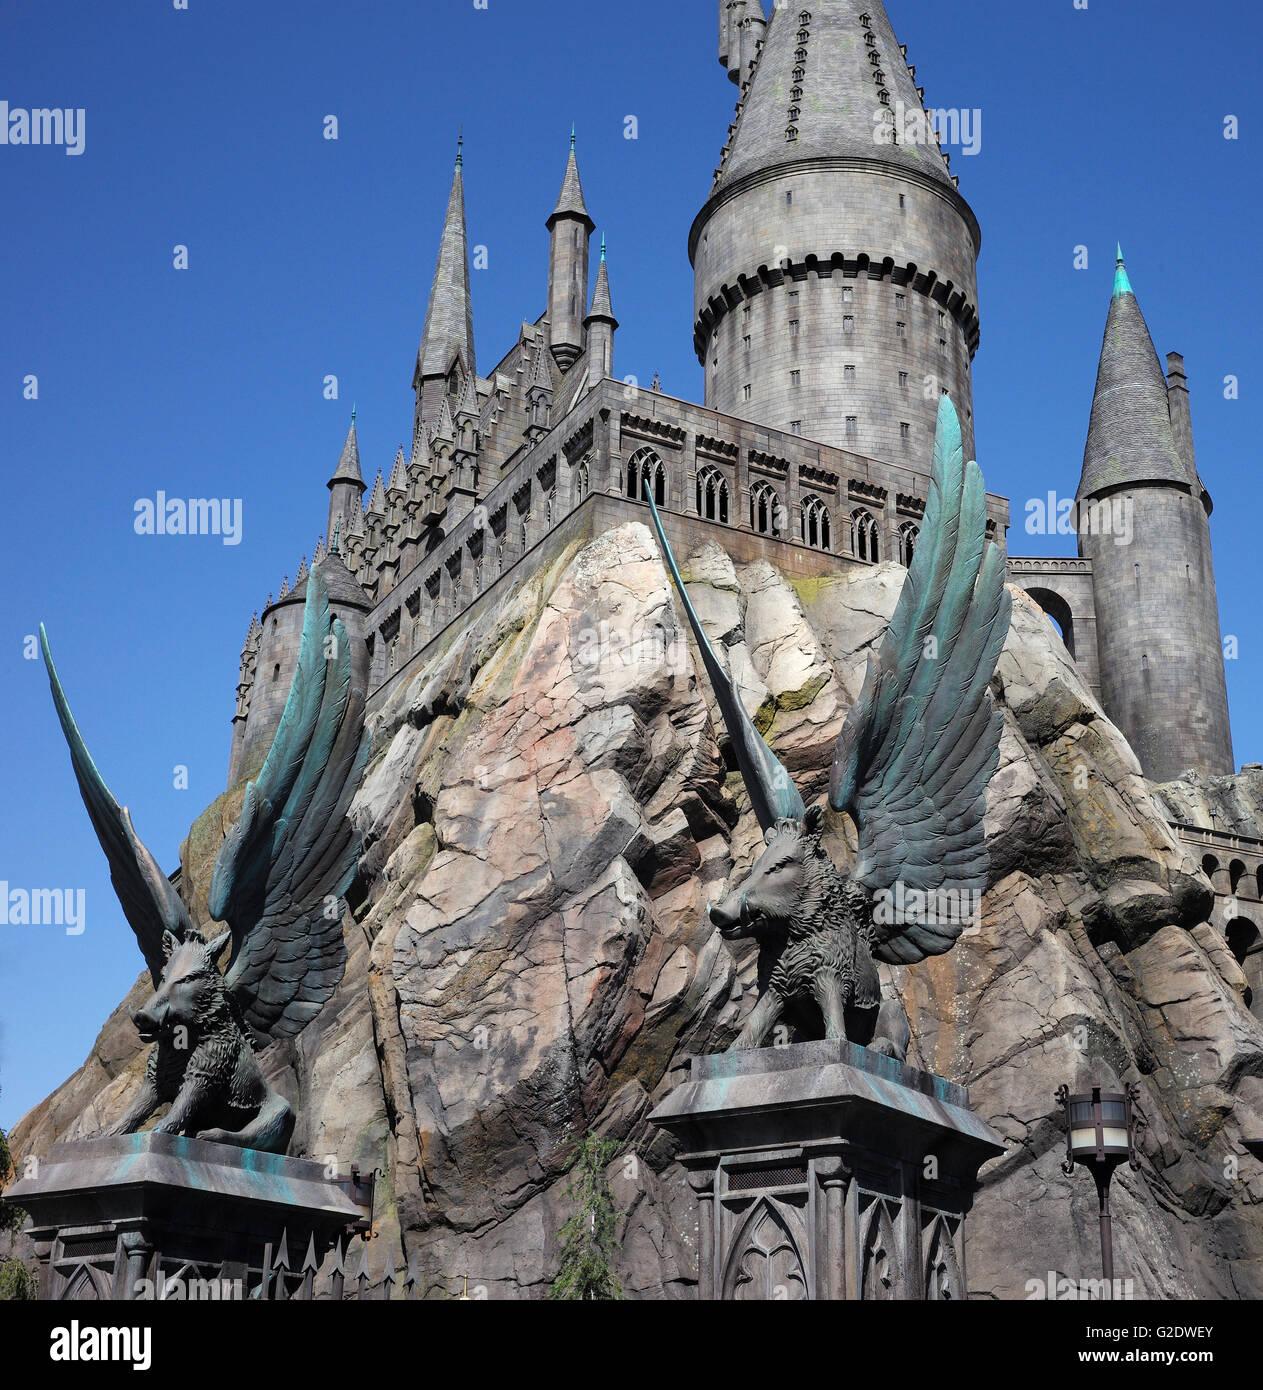 Hogwarts castle at Universal Studios Hollywood California - Stock Image